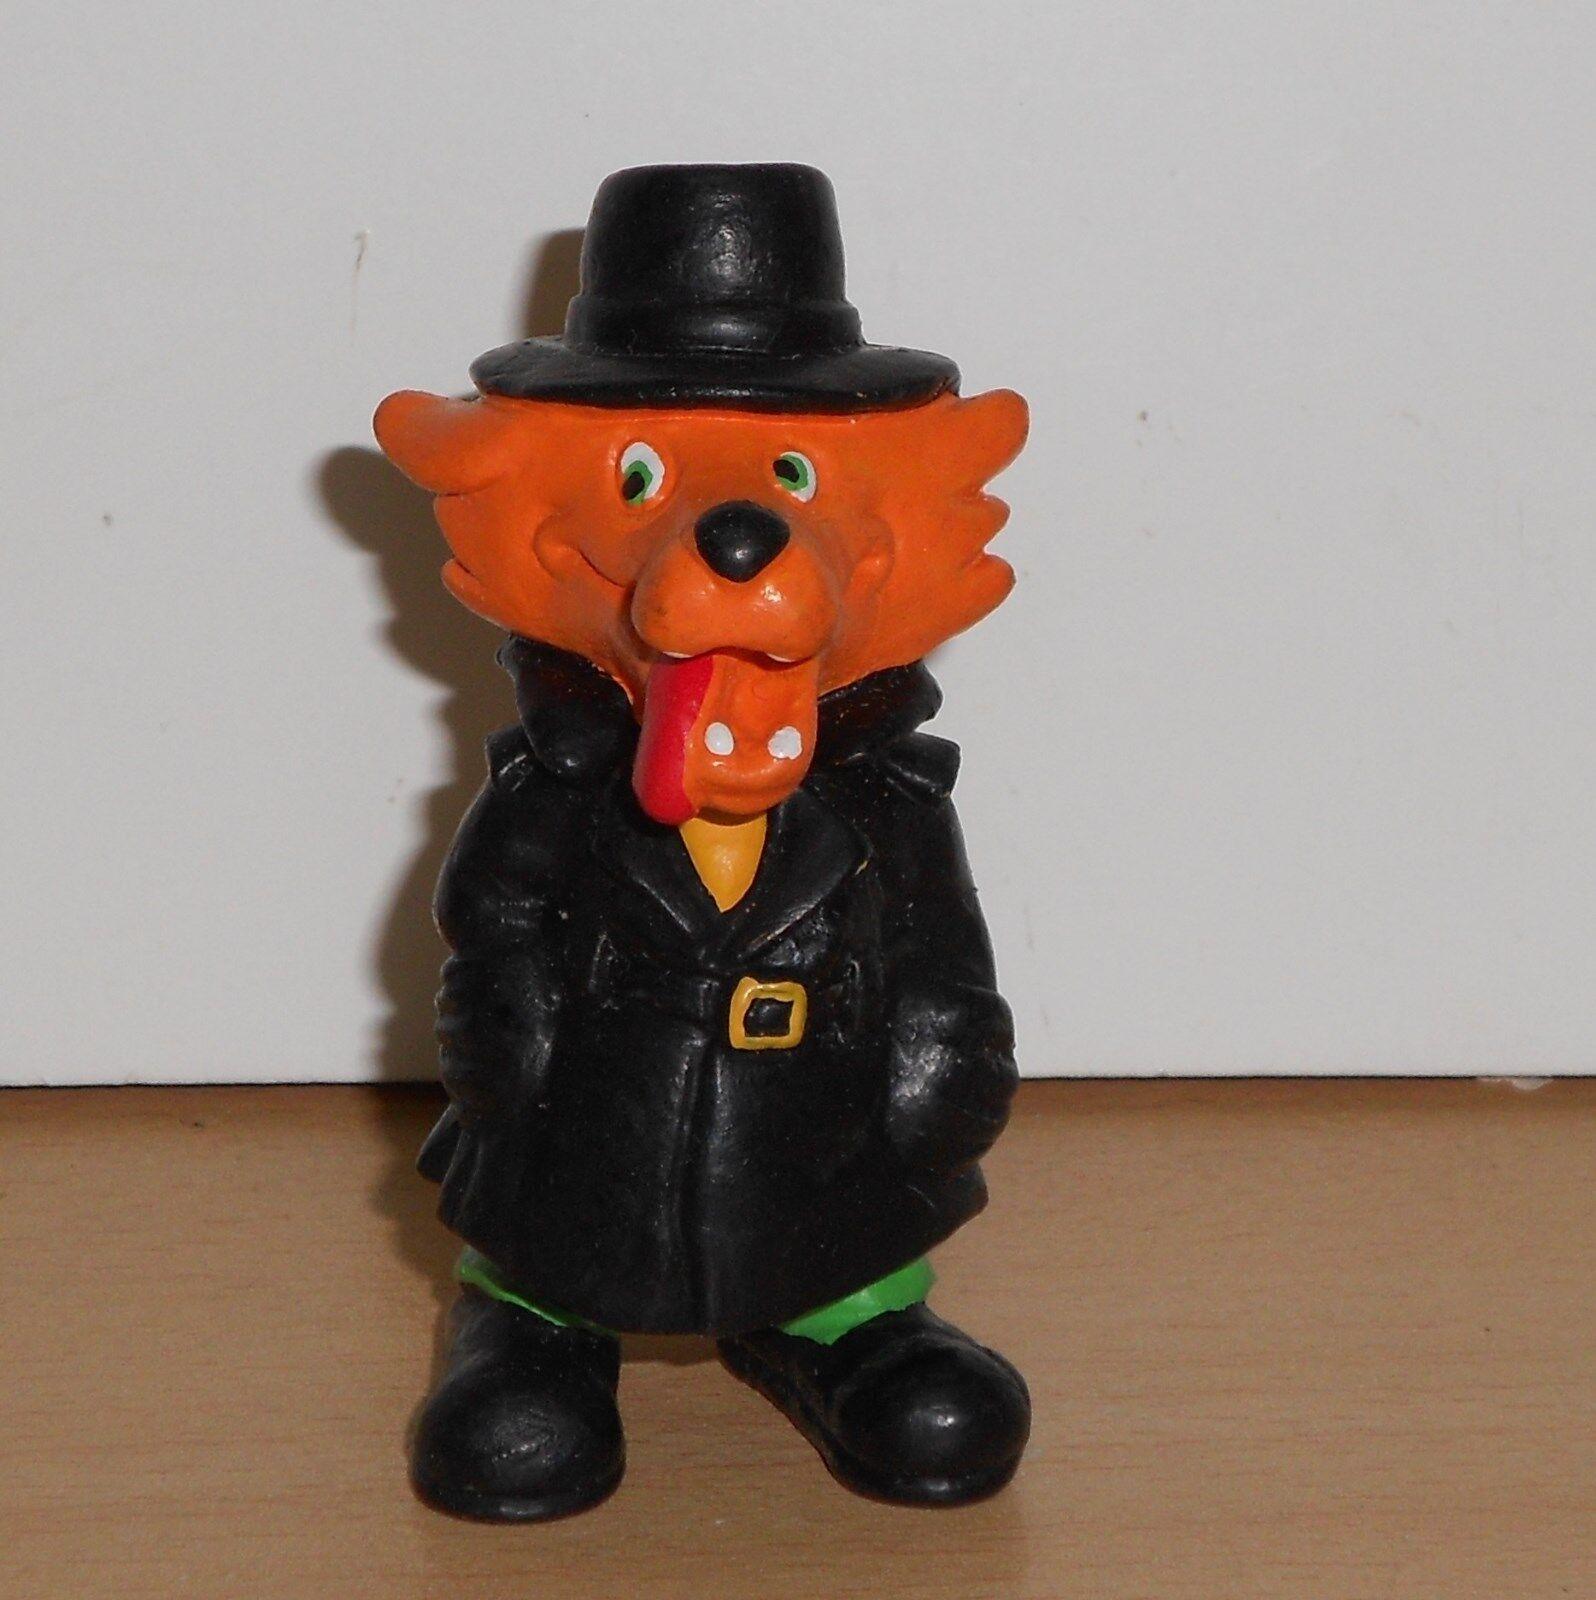 Mascot RTC TV Show 123 OURA HOTEL Figure Figurine Wolf detective - MAIA BORGES